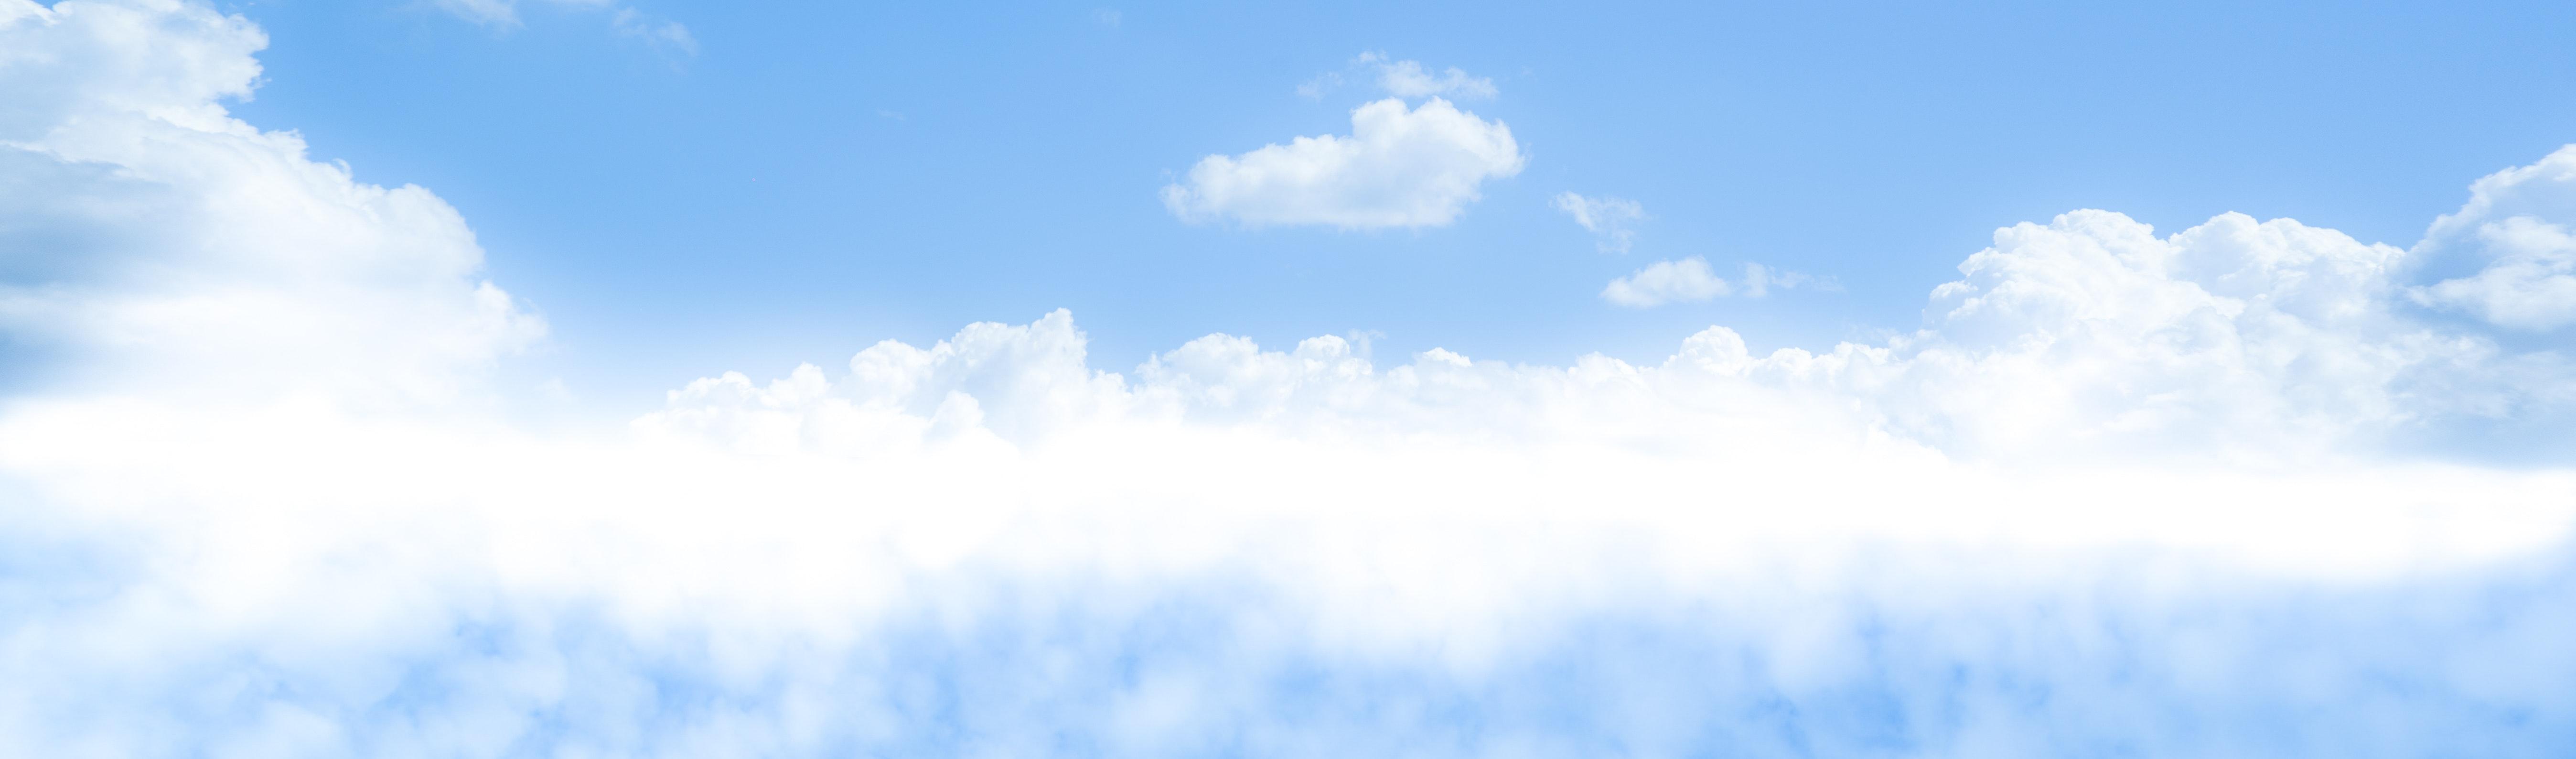 Sky Images Pexels Free Stock Photos